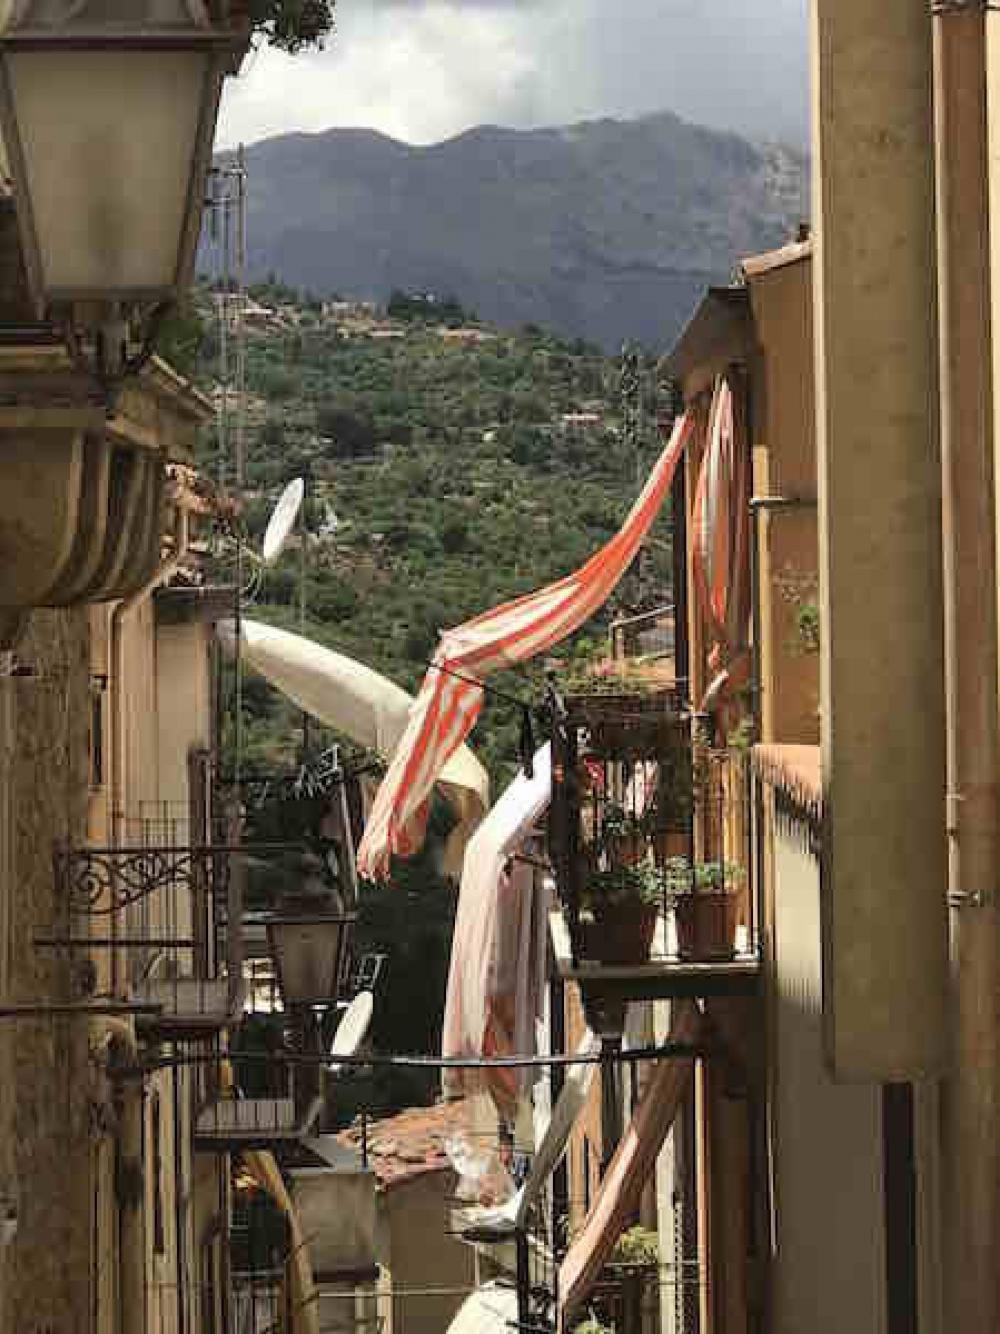 170821 Castelbuono Alley